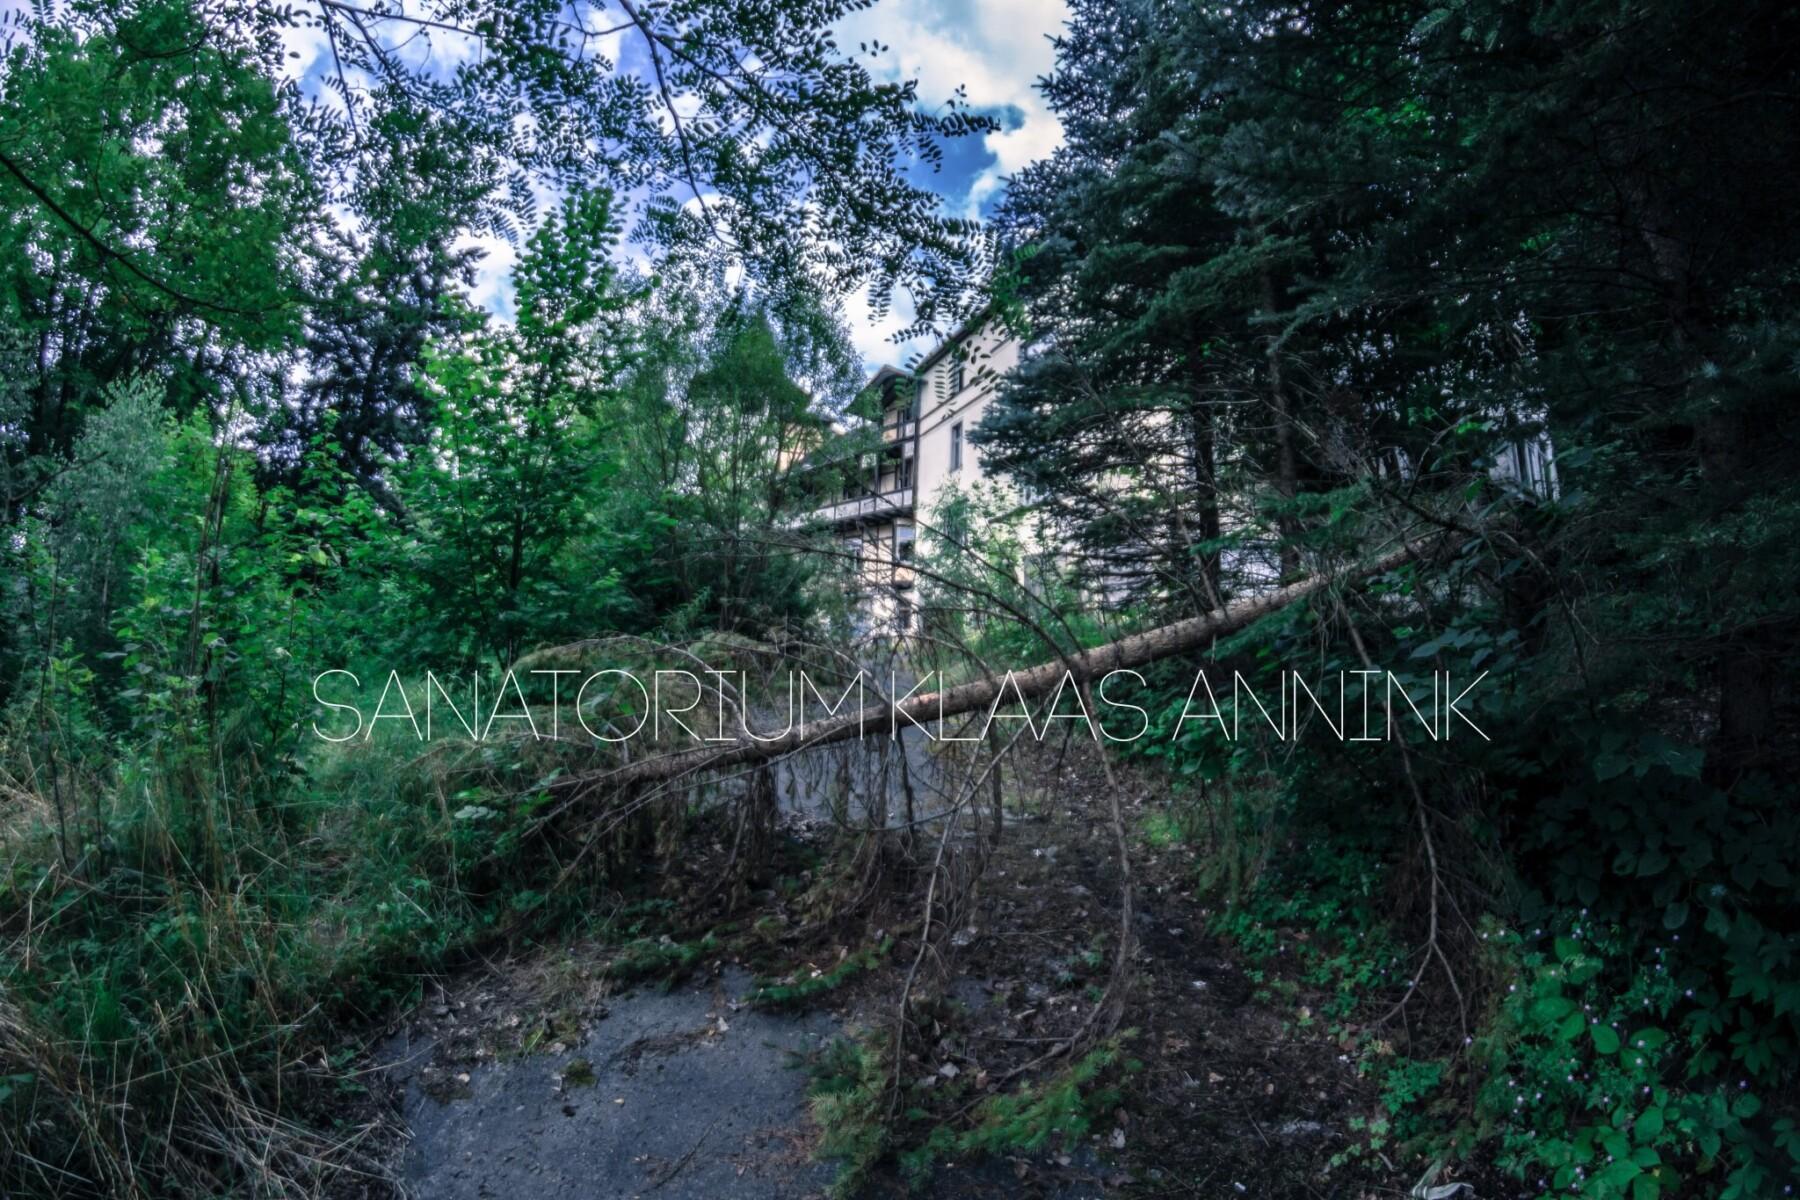 sanatorium-klaas-annink-0